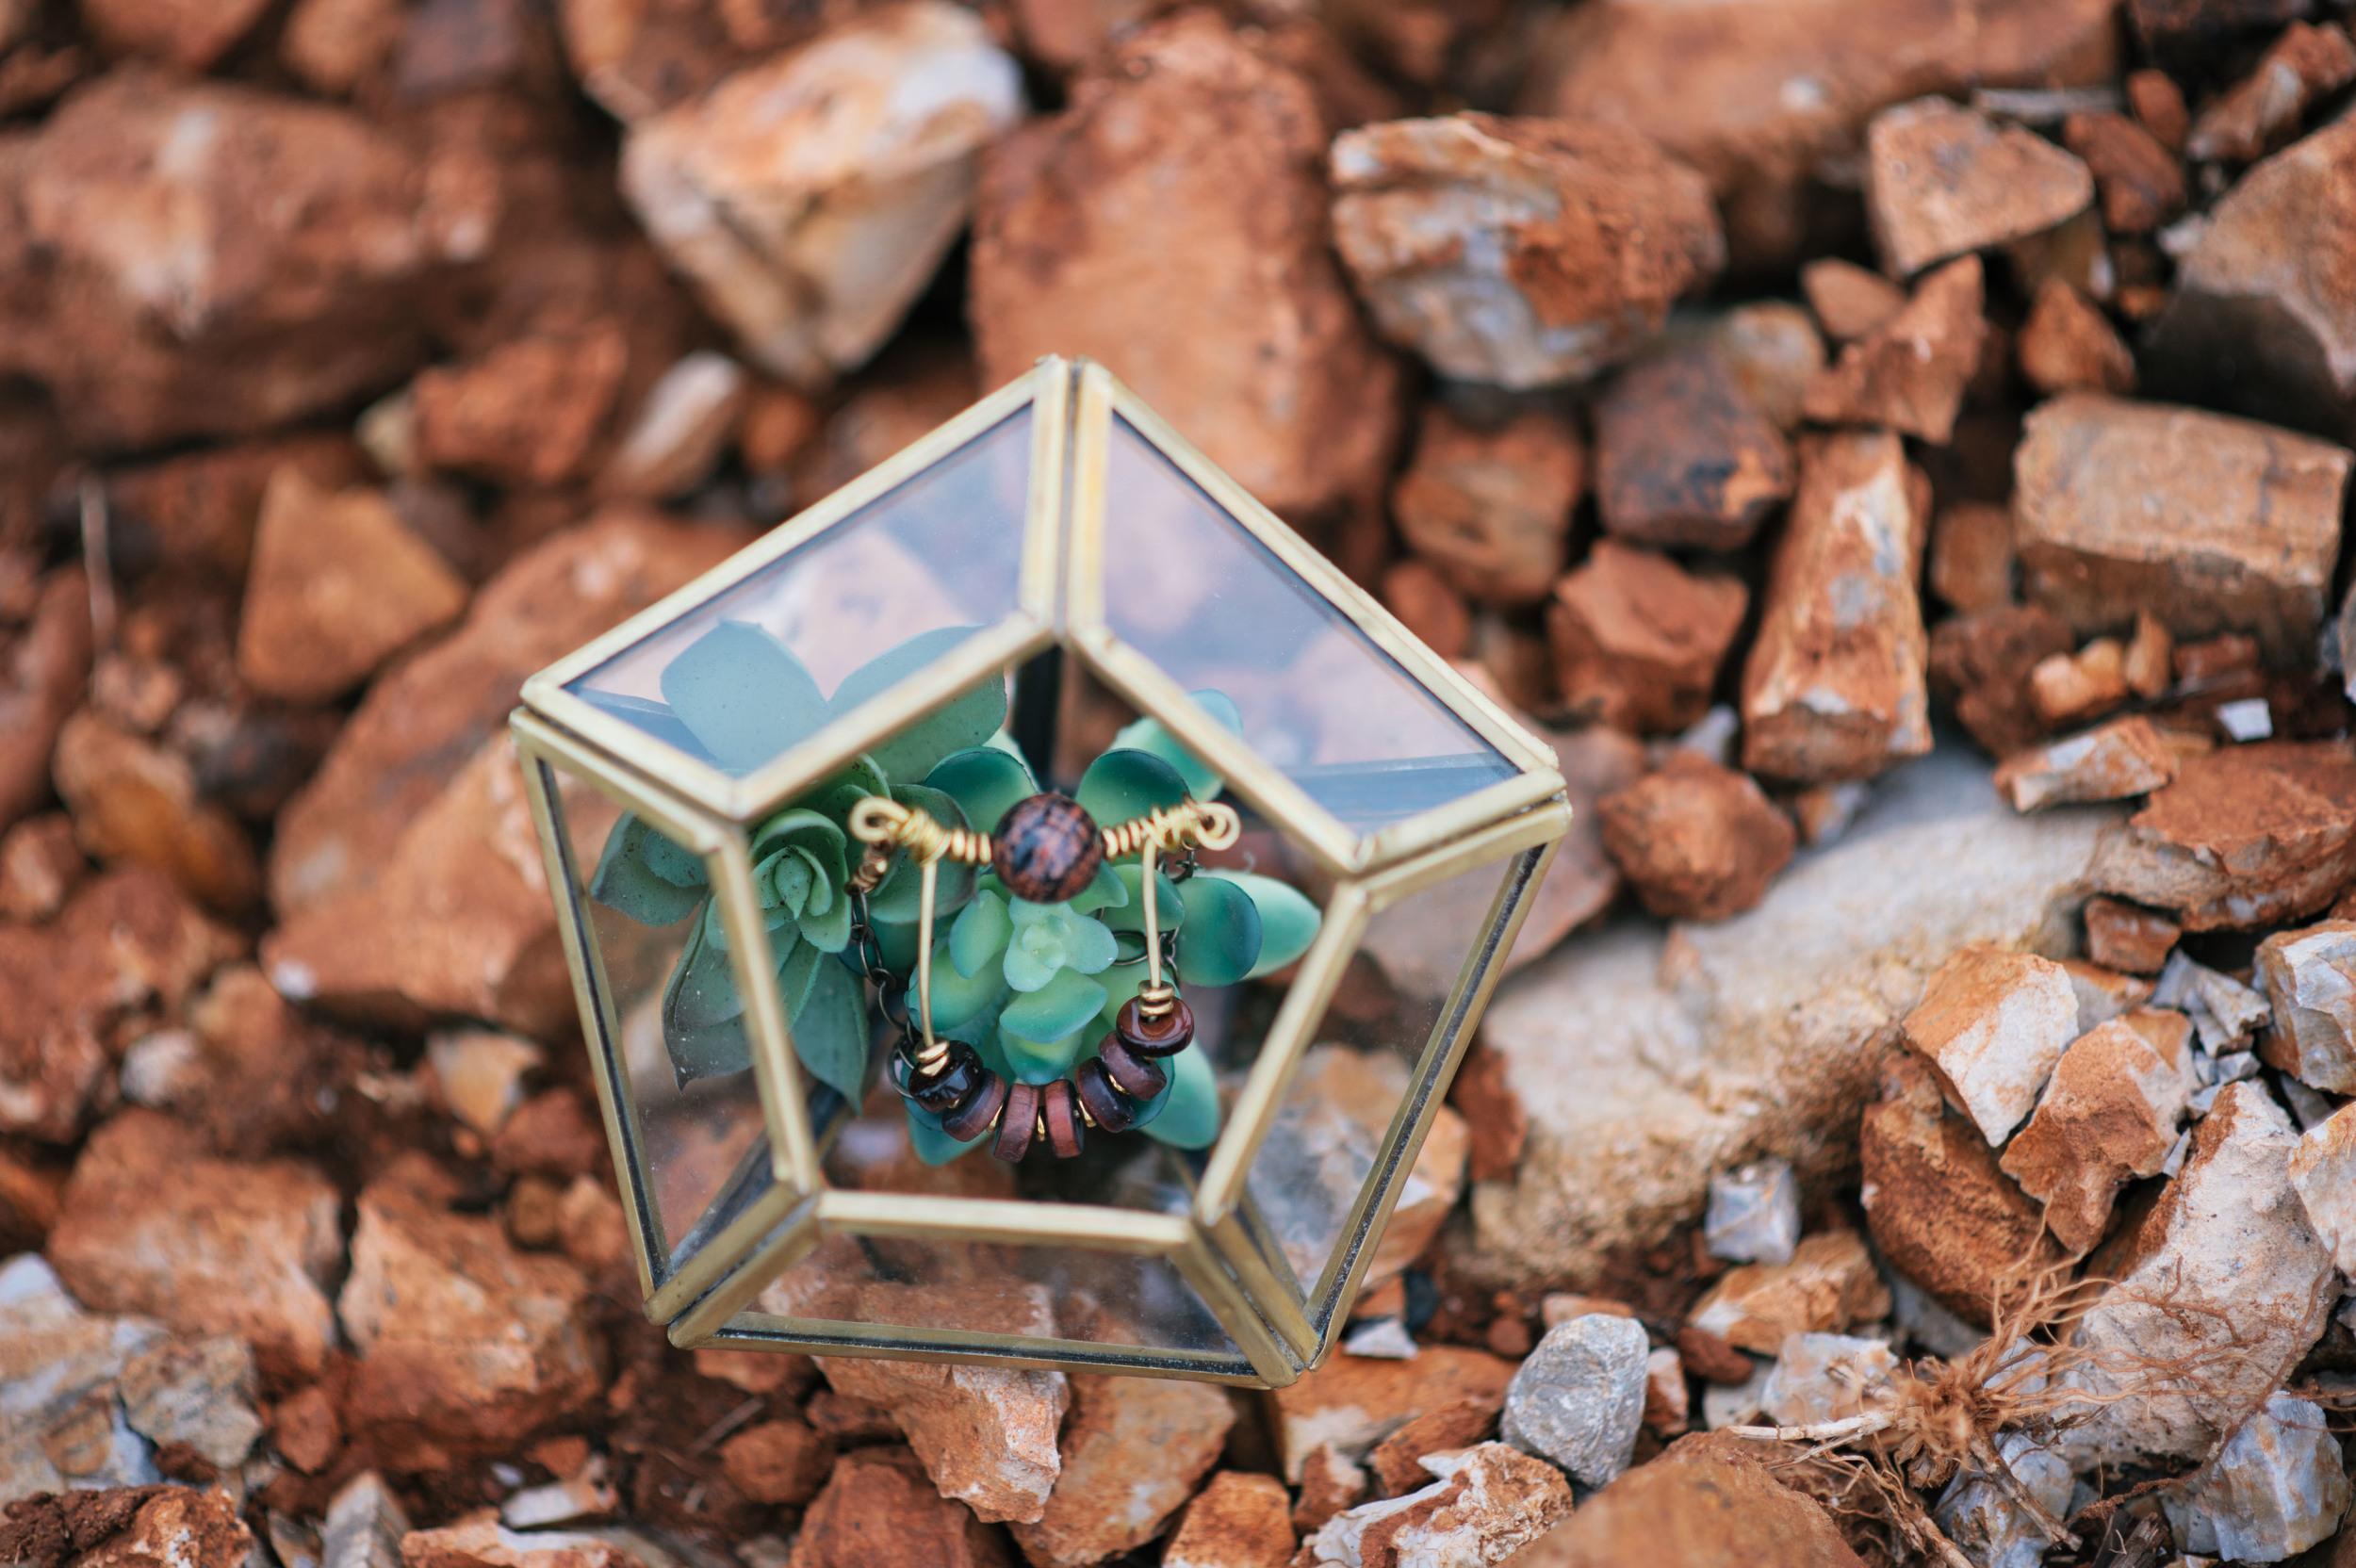 savannah-photographer-simon-and-ruby-desert-sunset-collection-hazel-and-scout-styling-sisters-of-nature-boutique-moab-utah-photos-huntsville-alabama-photographer-desert-shoot-onyx-model-management-mnewsom-photography-desert-photos.jpg